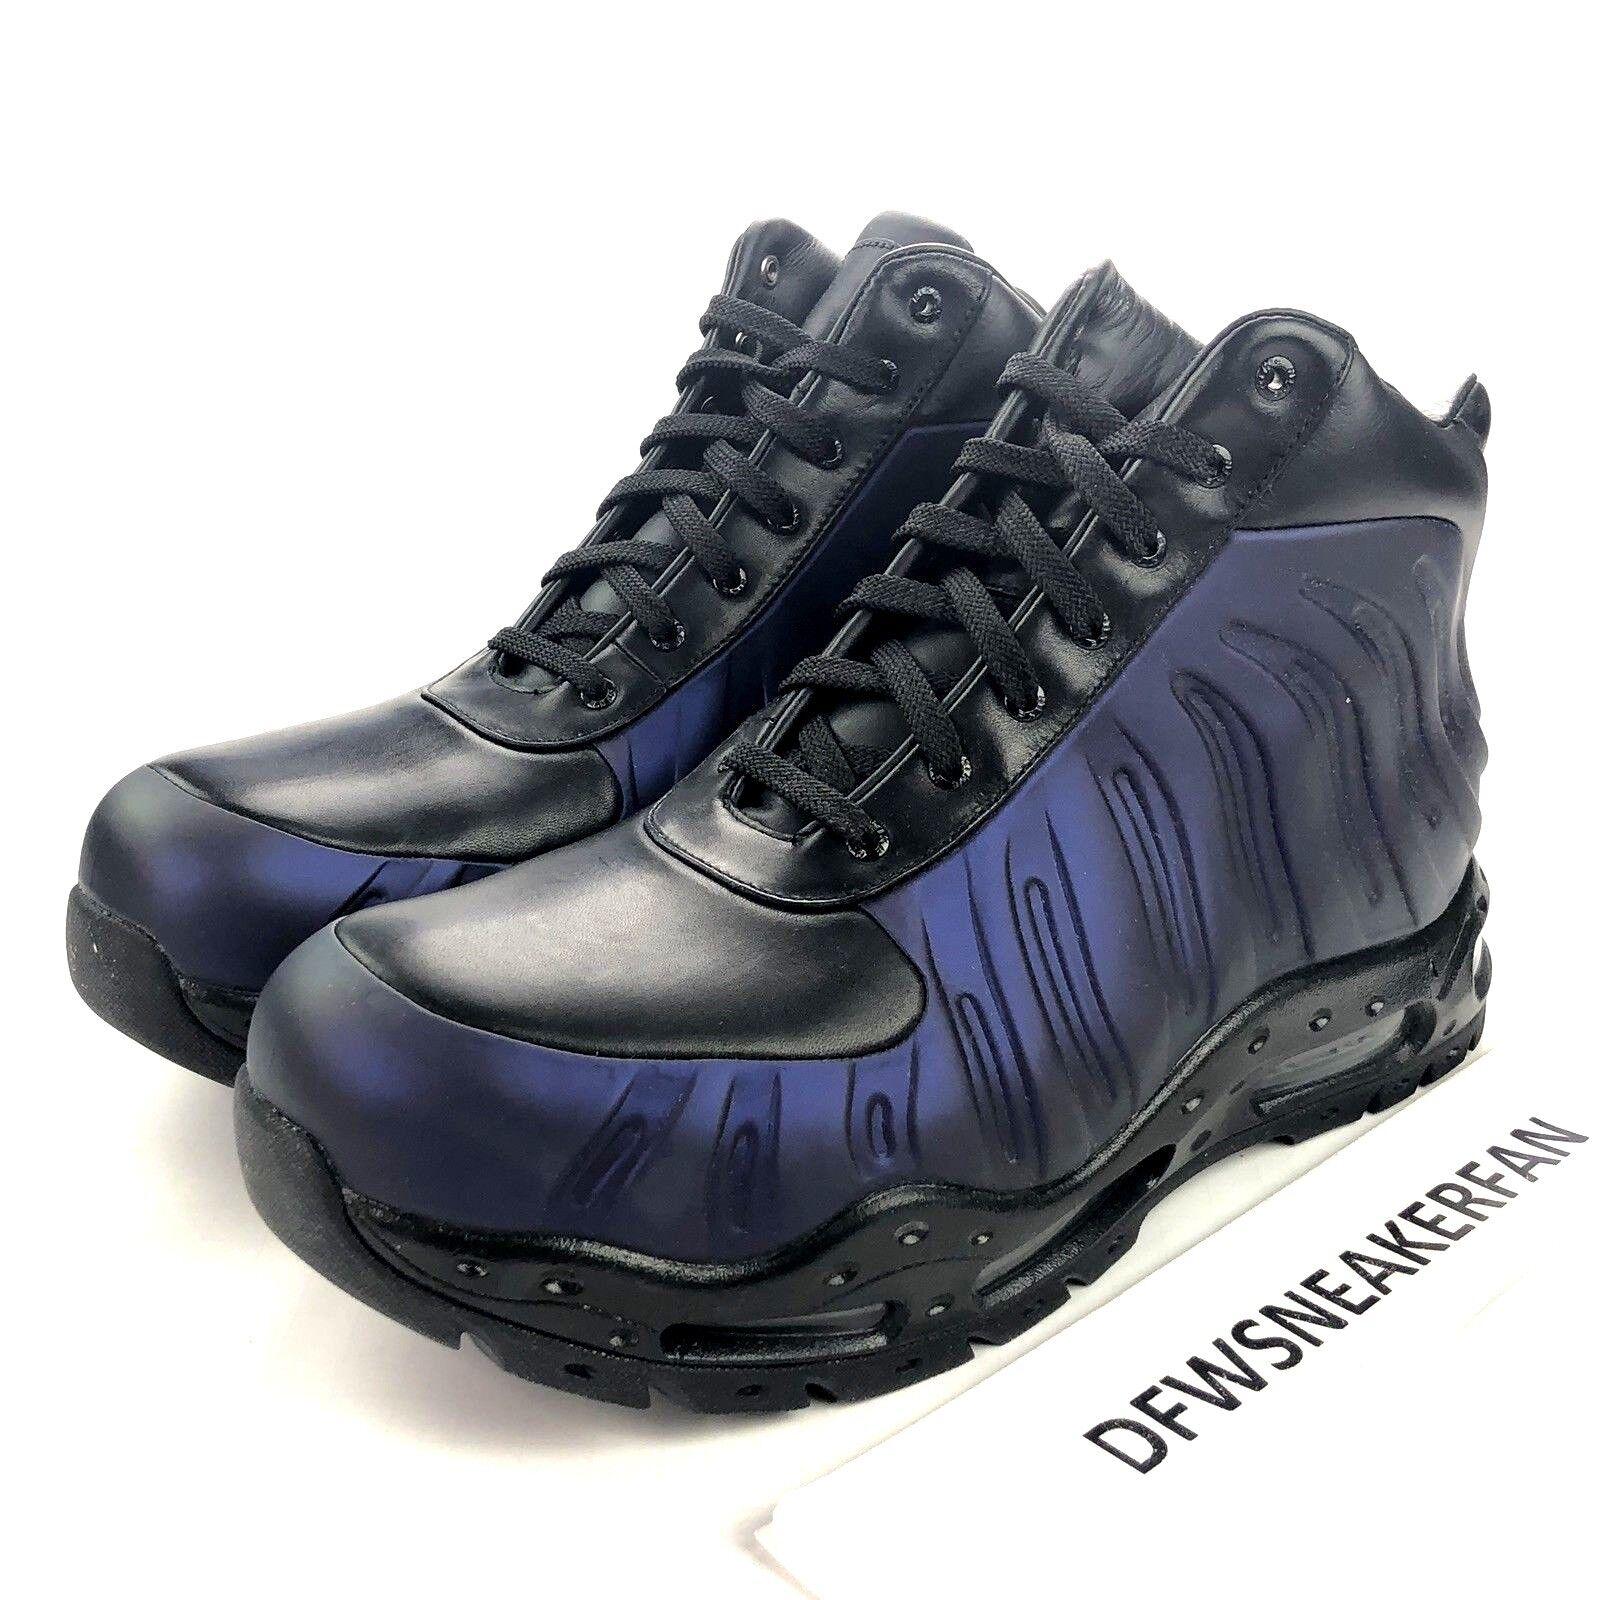 Nike Air Max Foamdome Men's Size 10 Foamposite Eggplant Boots 843749 500 New